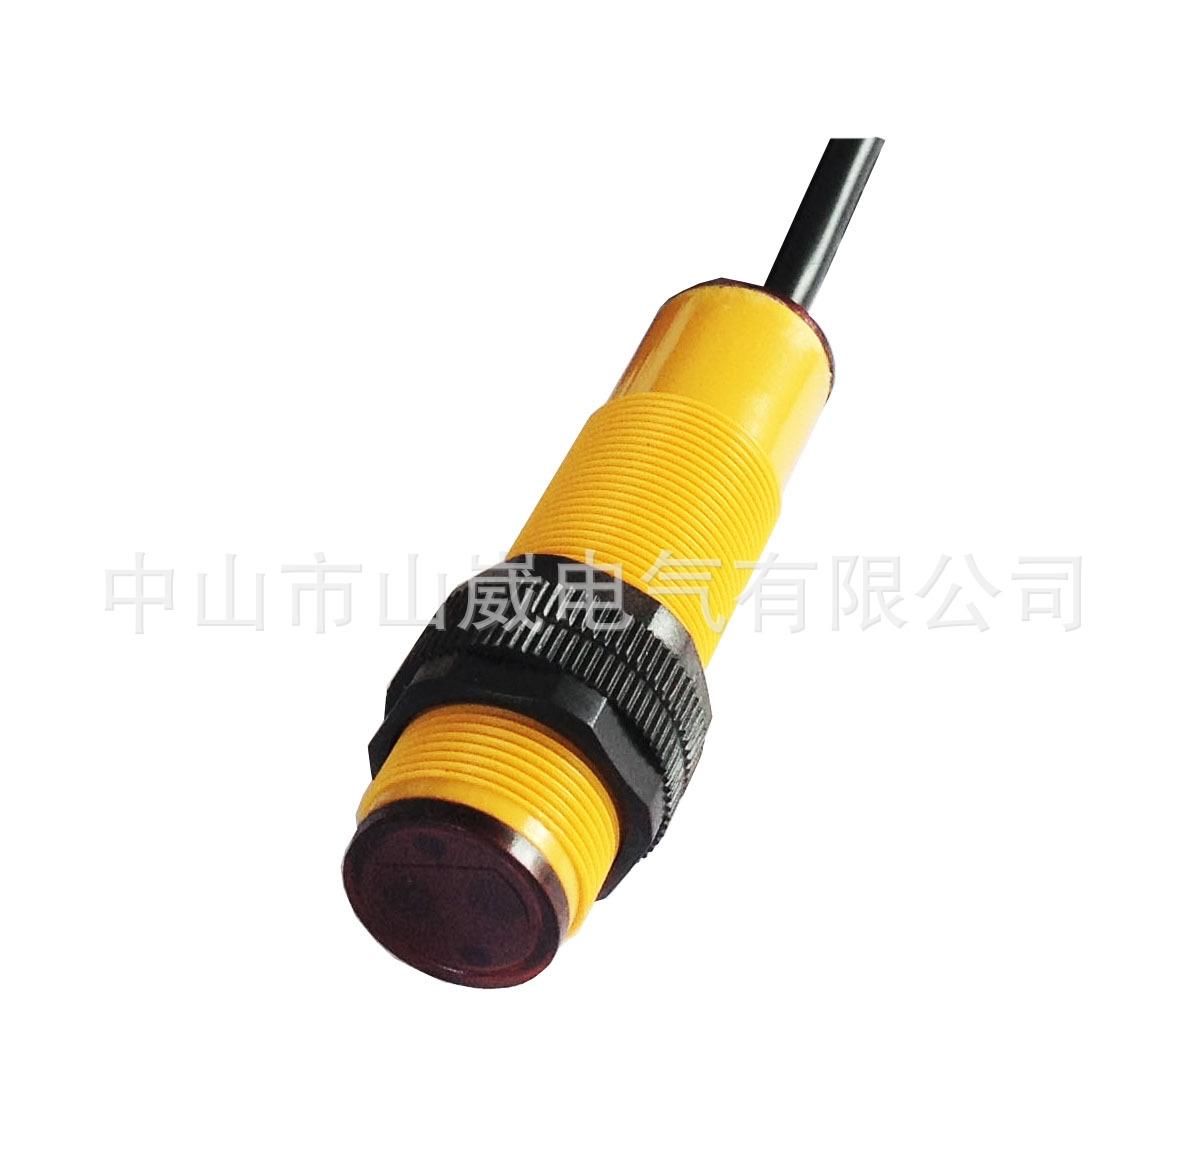 m18漫反射光电开关/红外线感应器npn图片